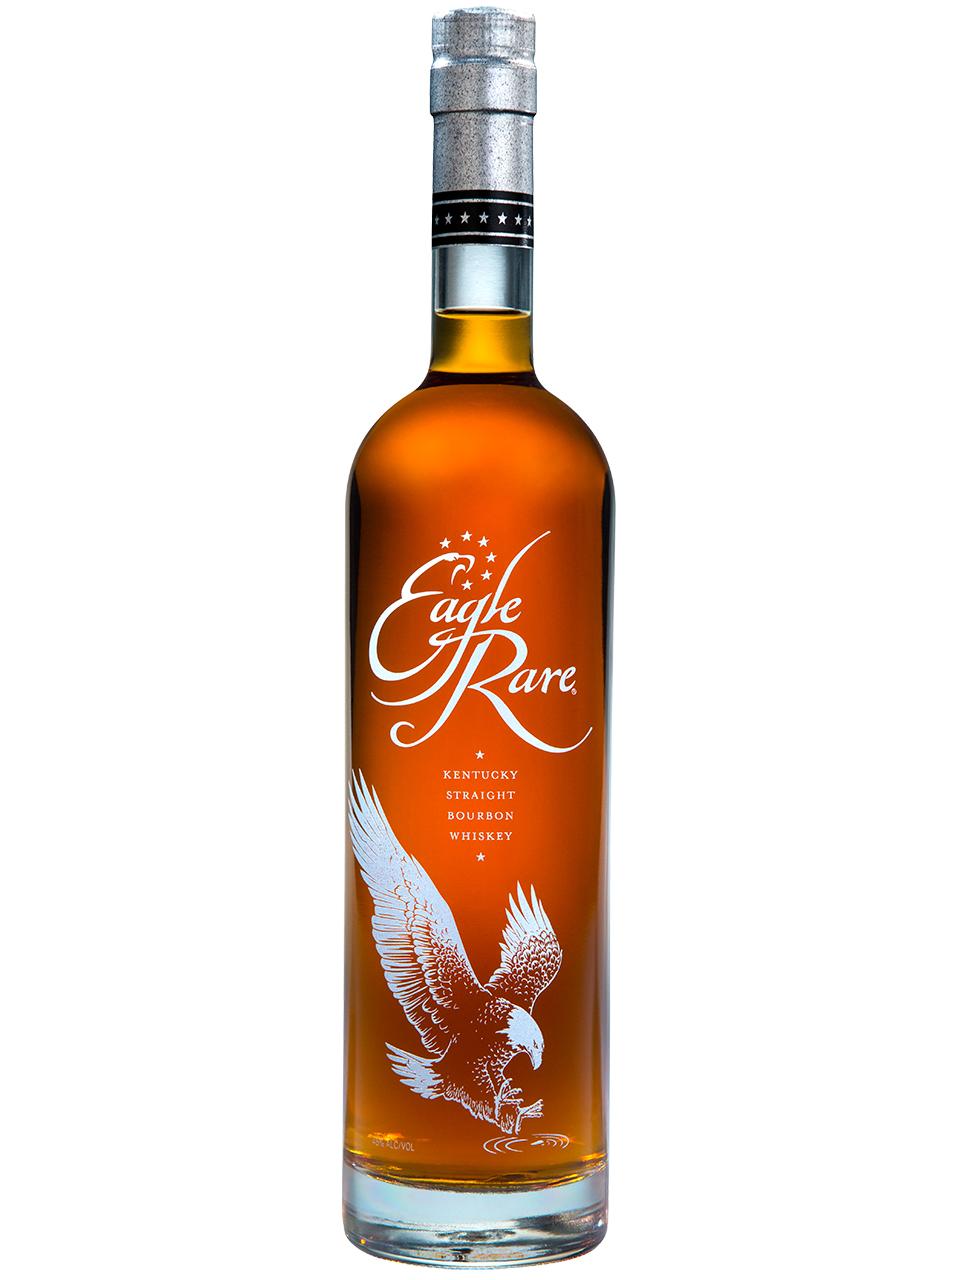 Eagle Rare Single Barrel Kentucky Straight Bourbon